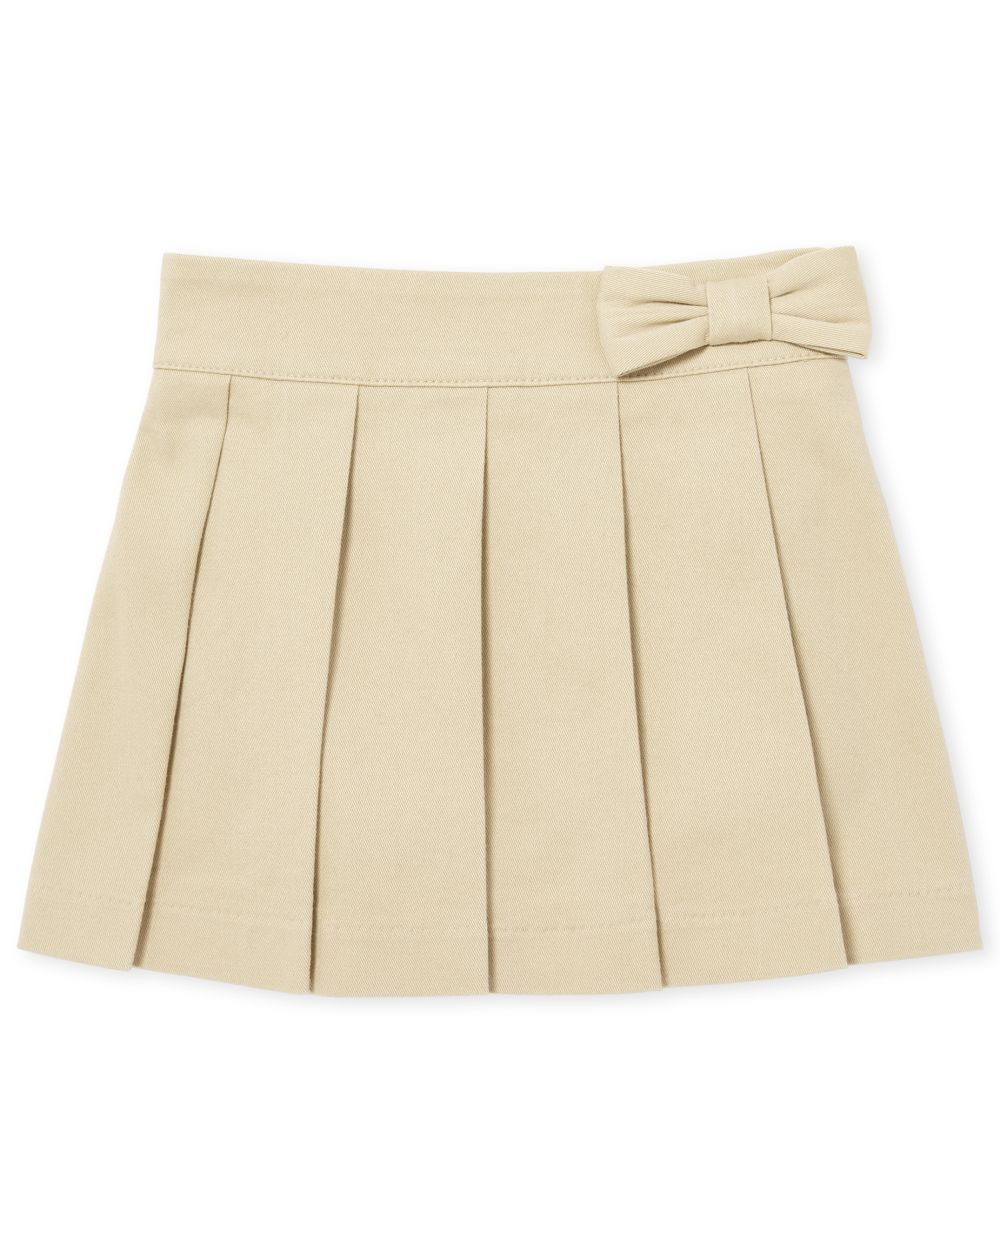 Toddler Girls Uniform Bow Pleated Pull On Skort